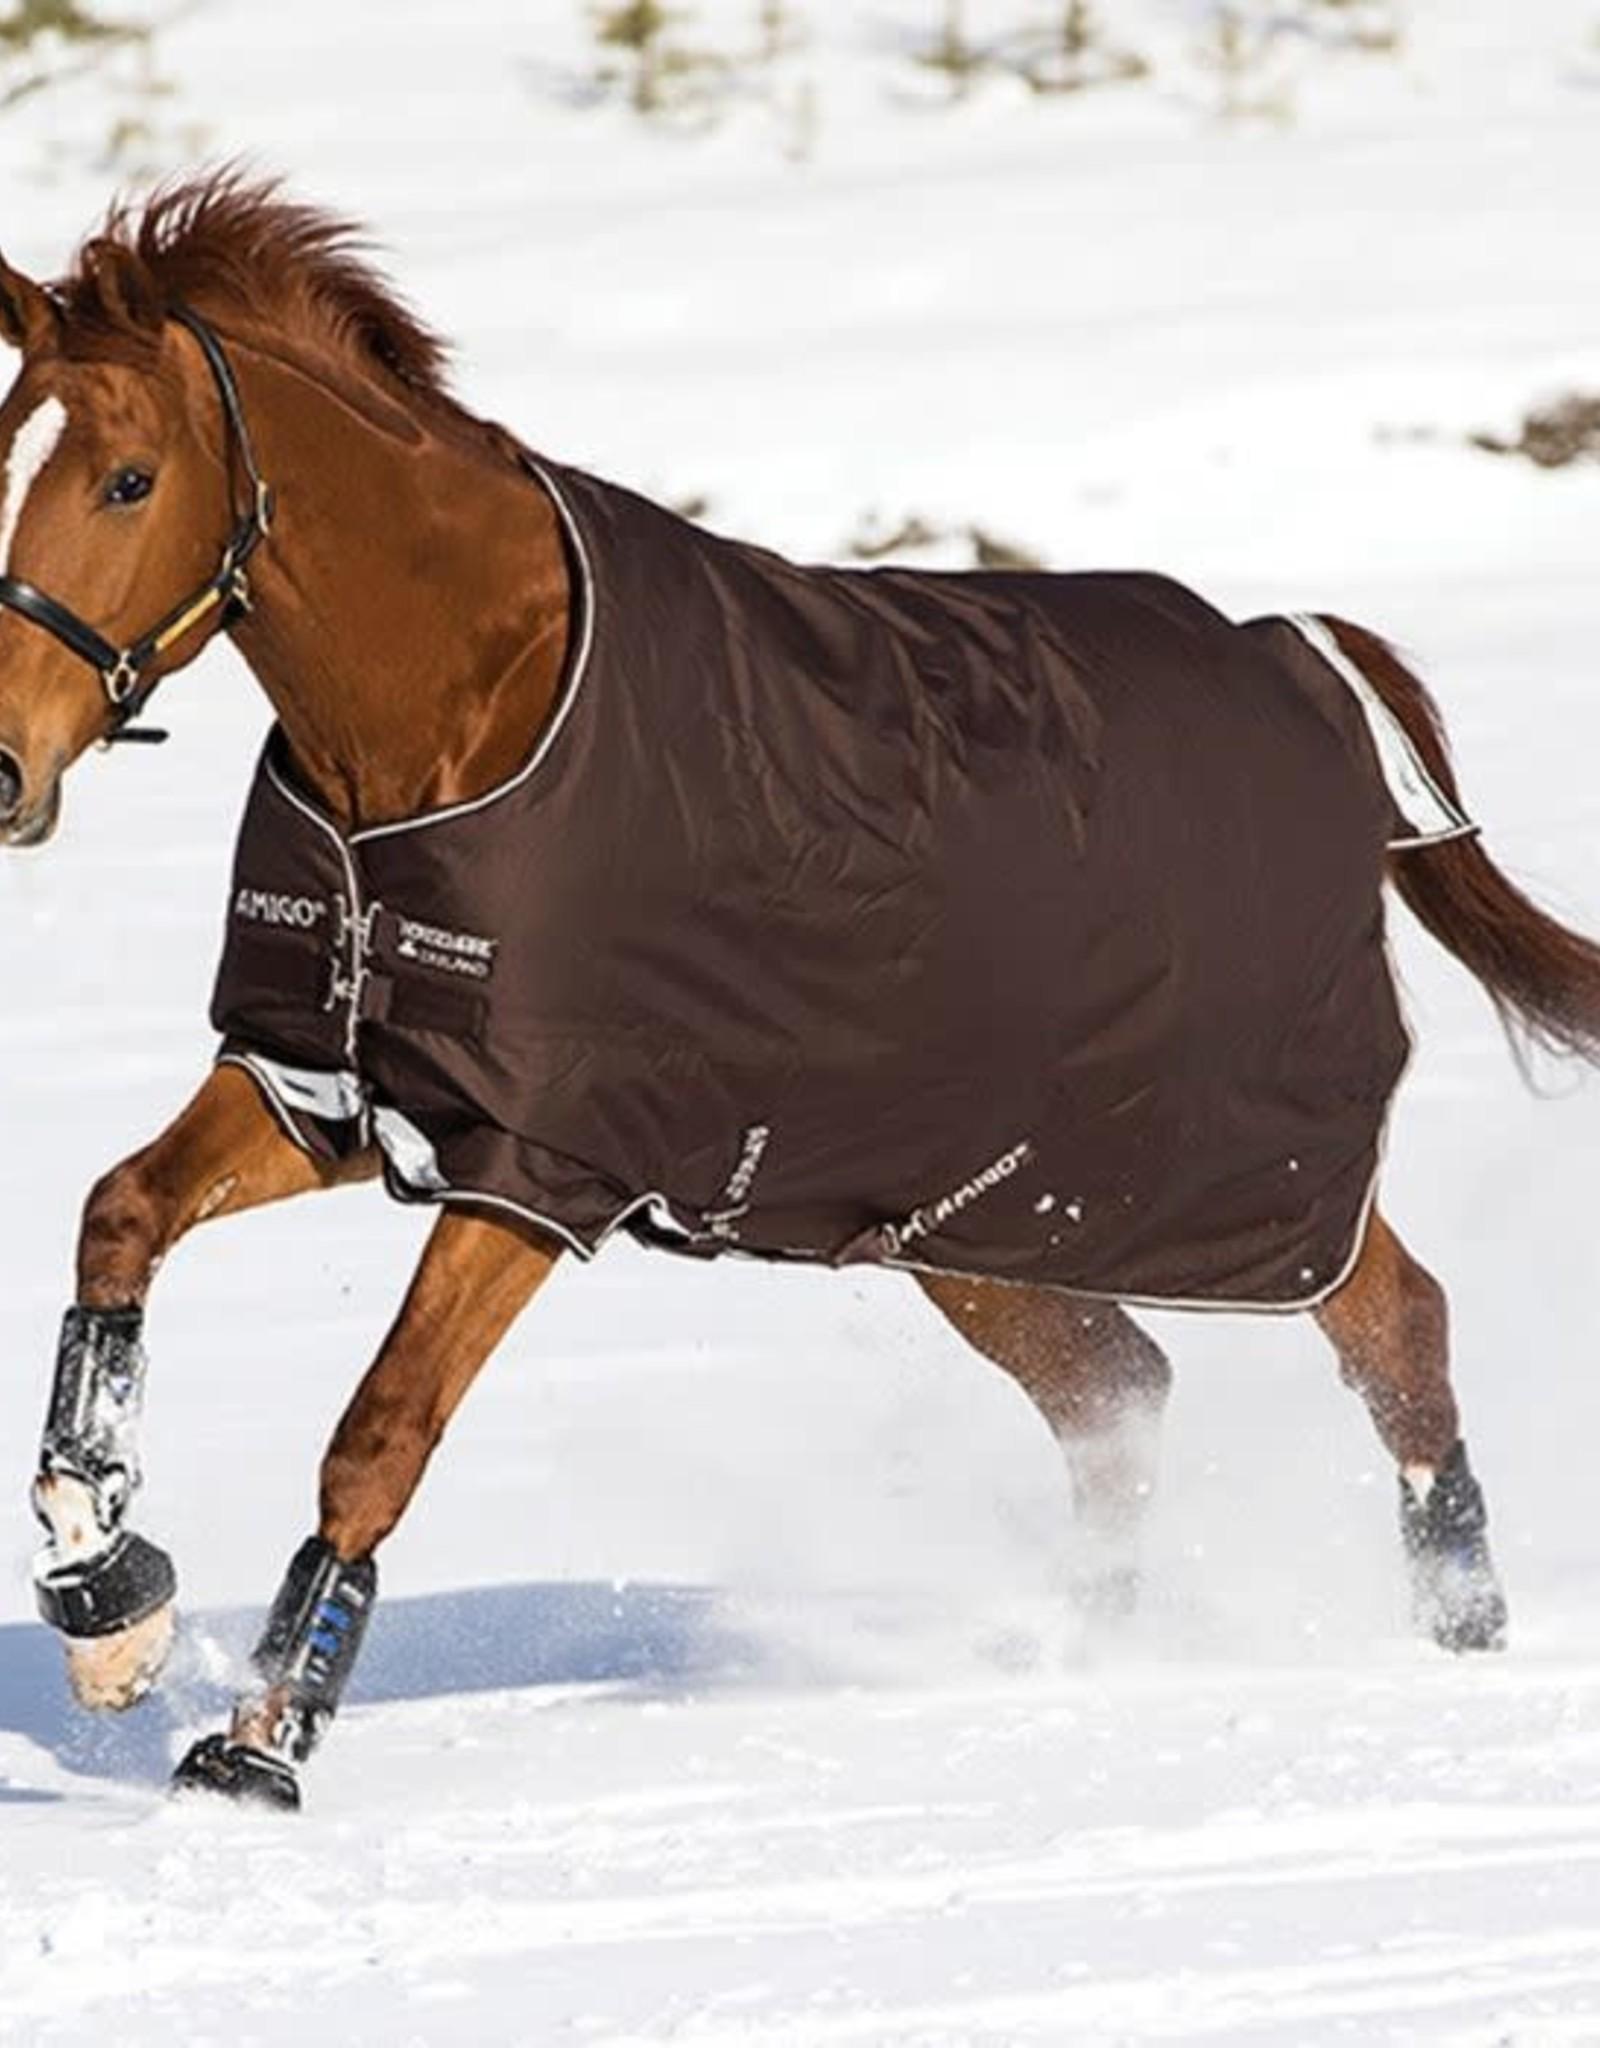 Horseware Amigo Bravo 12 Medium